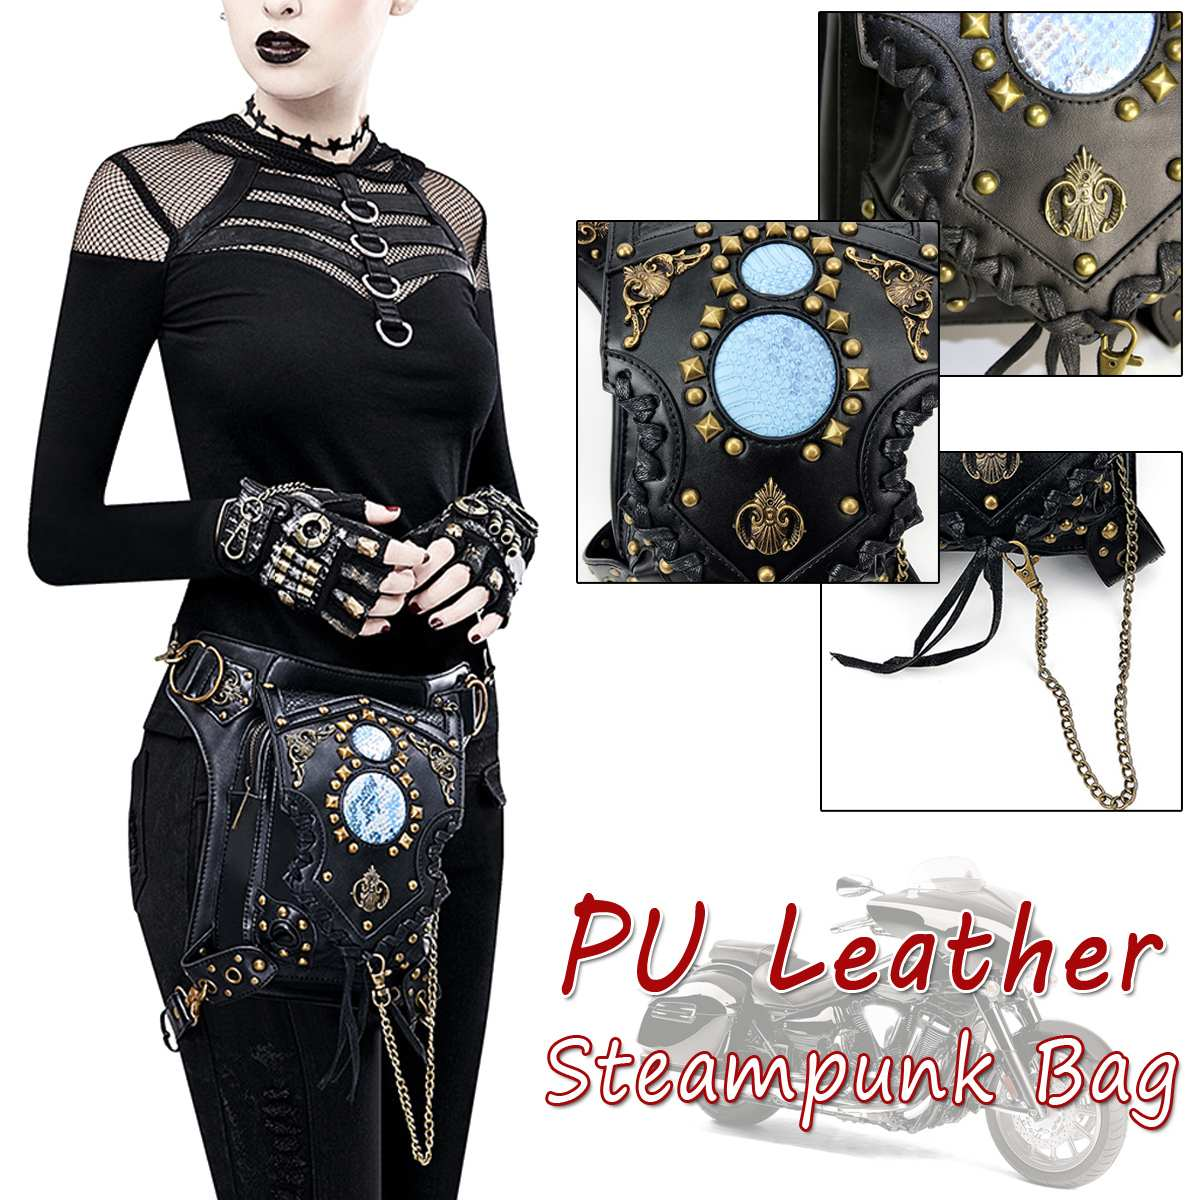 Black Unisex Steampunk Fanny Bag Steam Punk Retro Rock Gothic Bag Goth Shoulder Waist Bags Packs Fashion Motorcycle Leg Bags